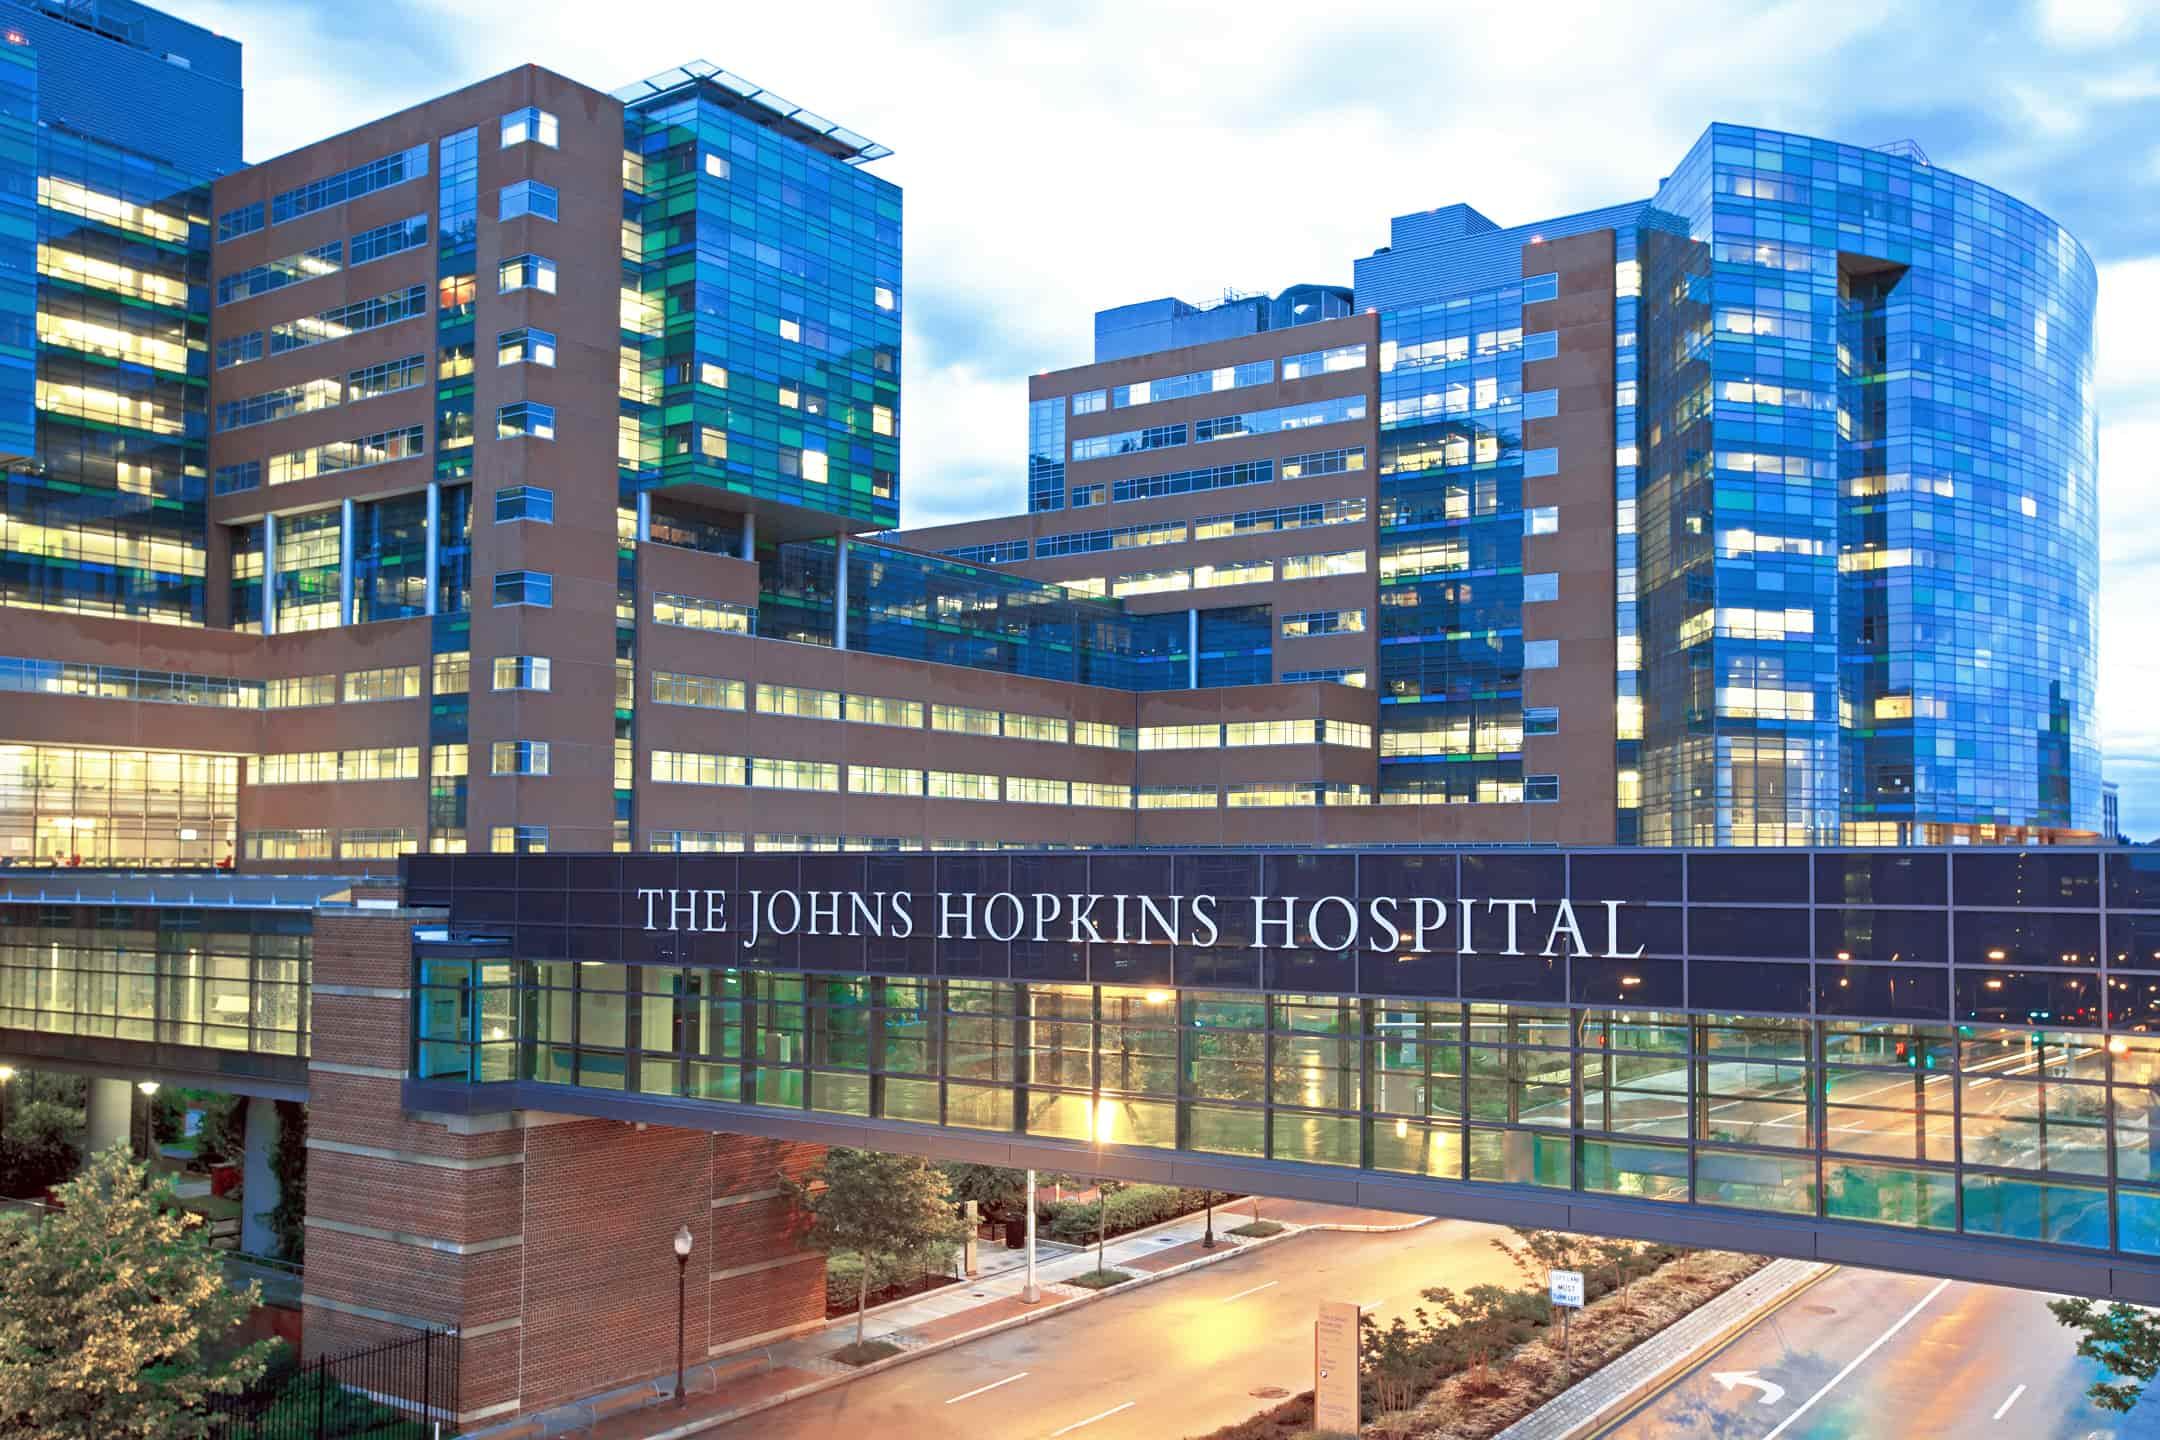 Johns Hopkins Hospital (Baltimore, Maryland)